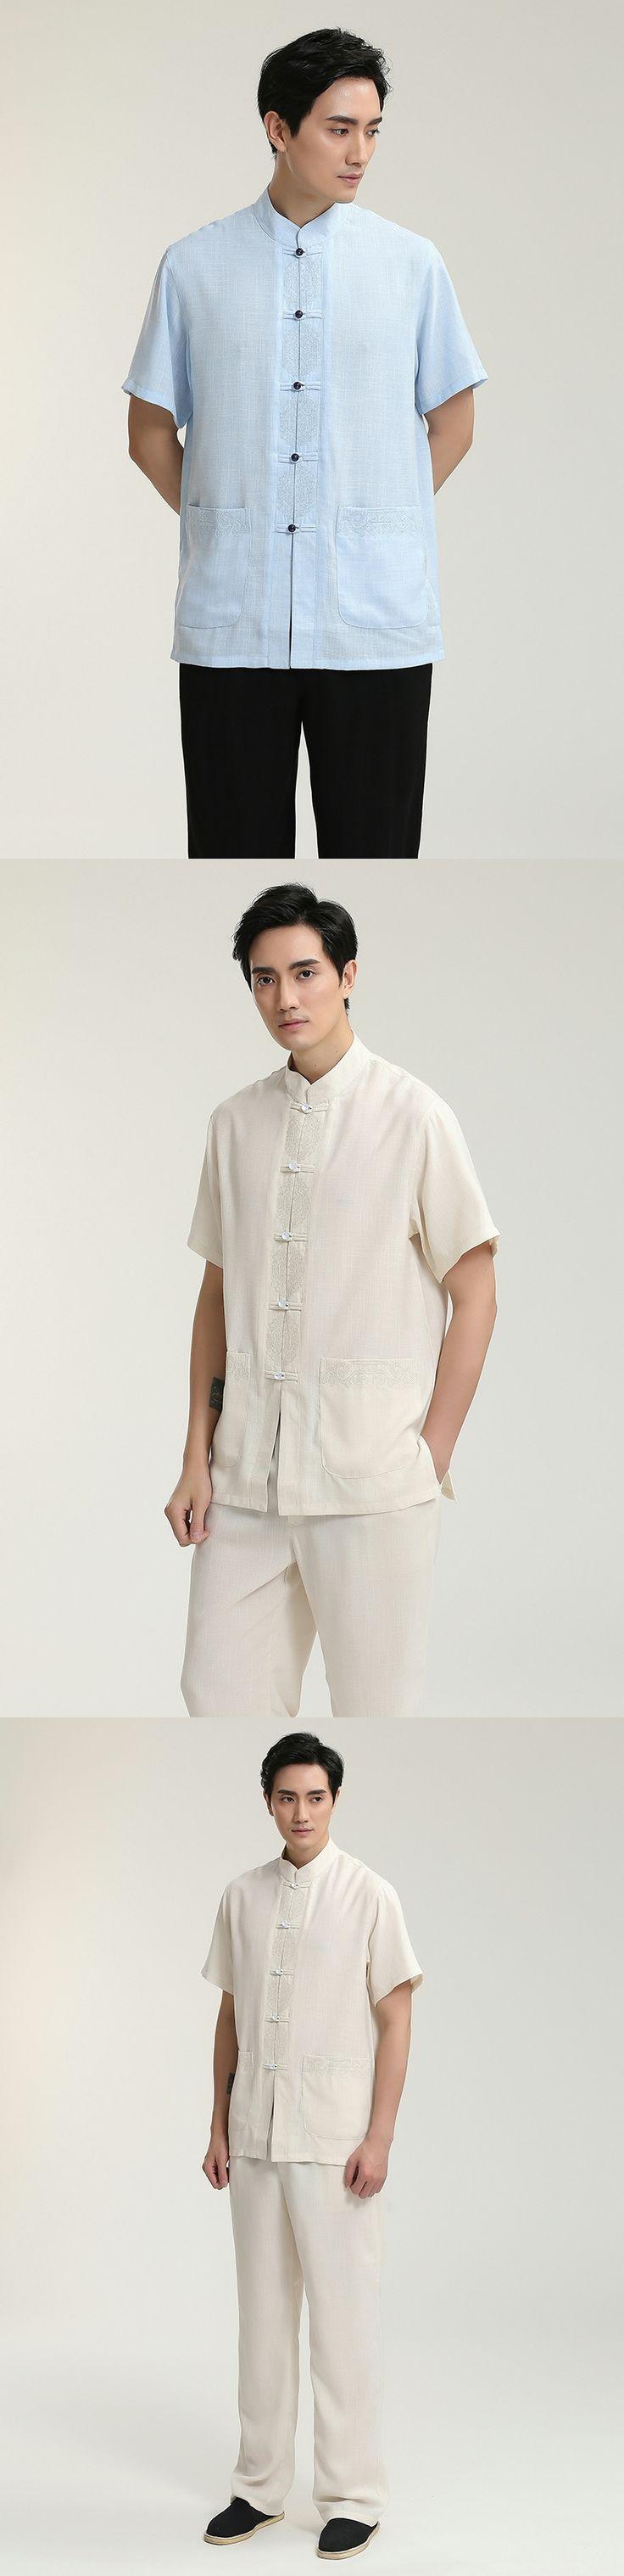 Beige Linen Shirts Men Short Sleeve Summer 2017 Chinese Style Clothing Standard Collar Tang Tops Plus Size Men's Casual Shirt